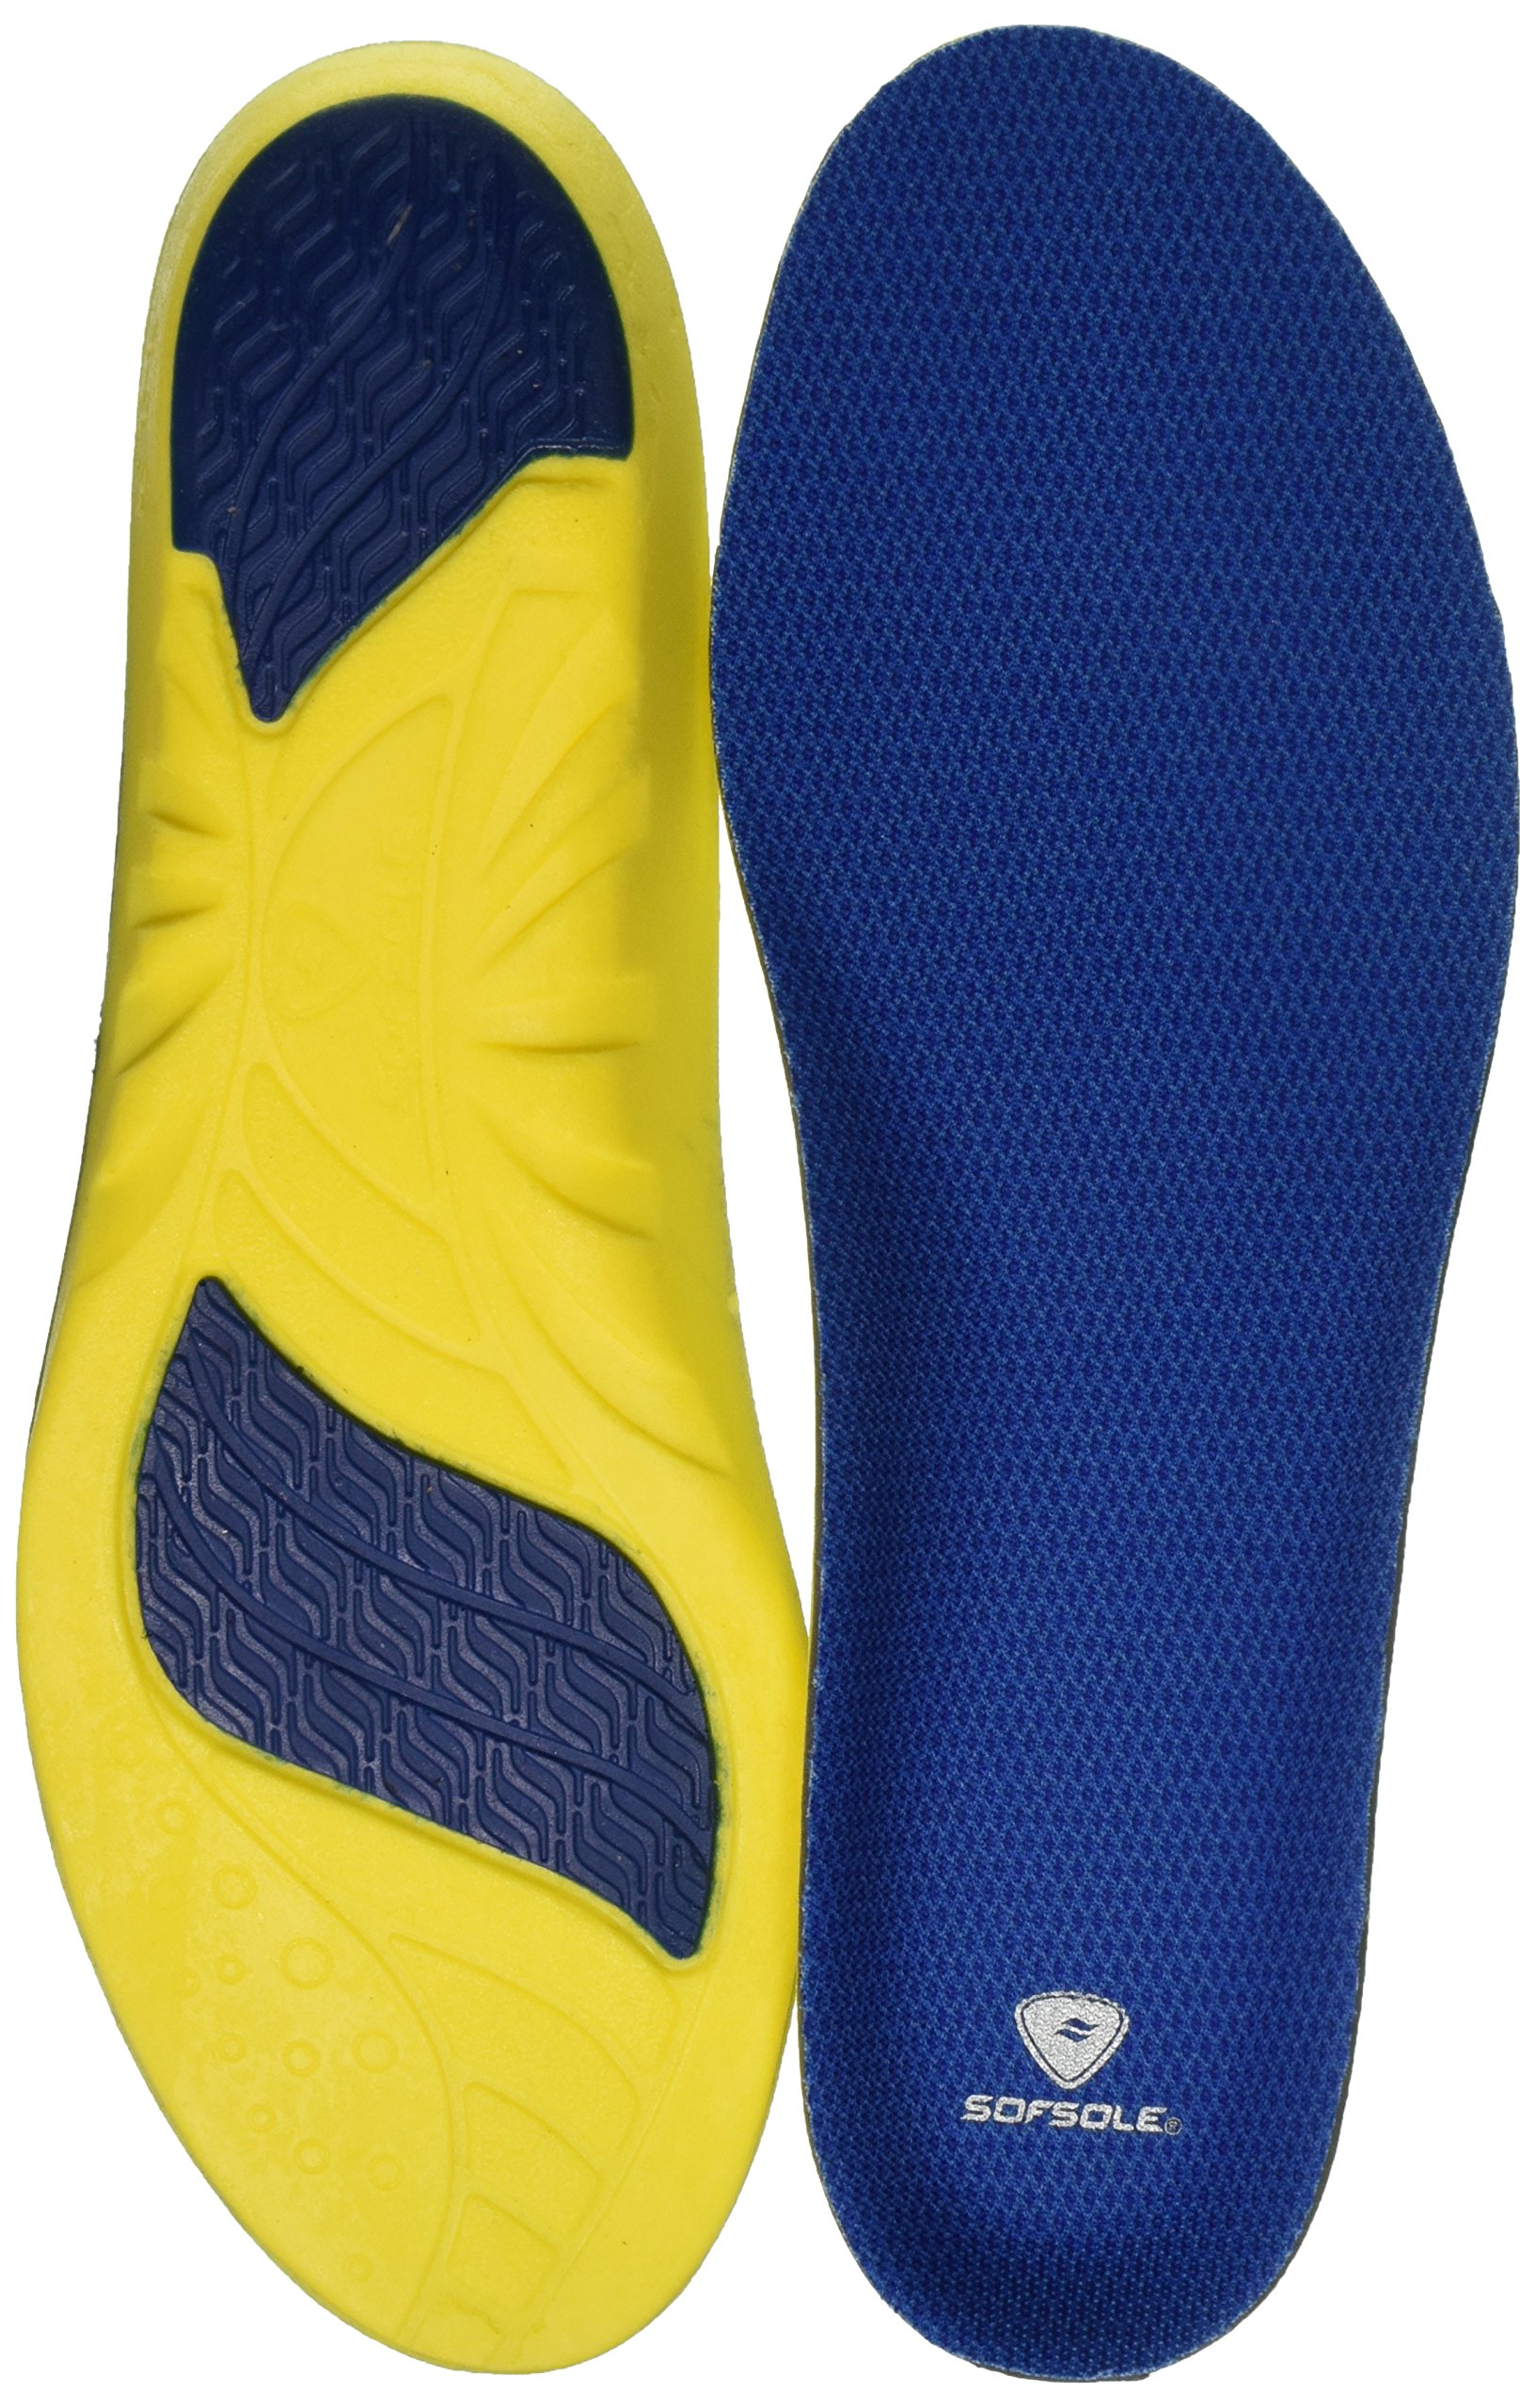 Sof Sole Athlete Neutral Arch Comfort Insole, Men's Size 13-14